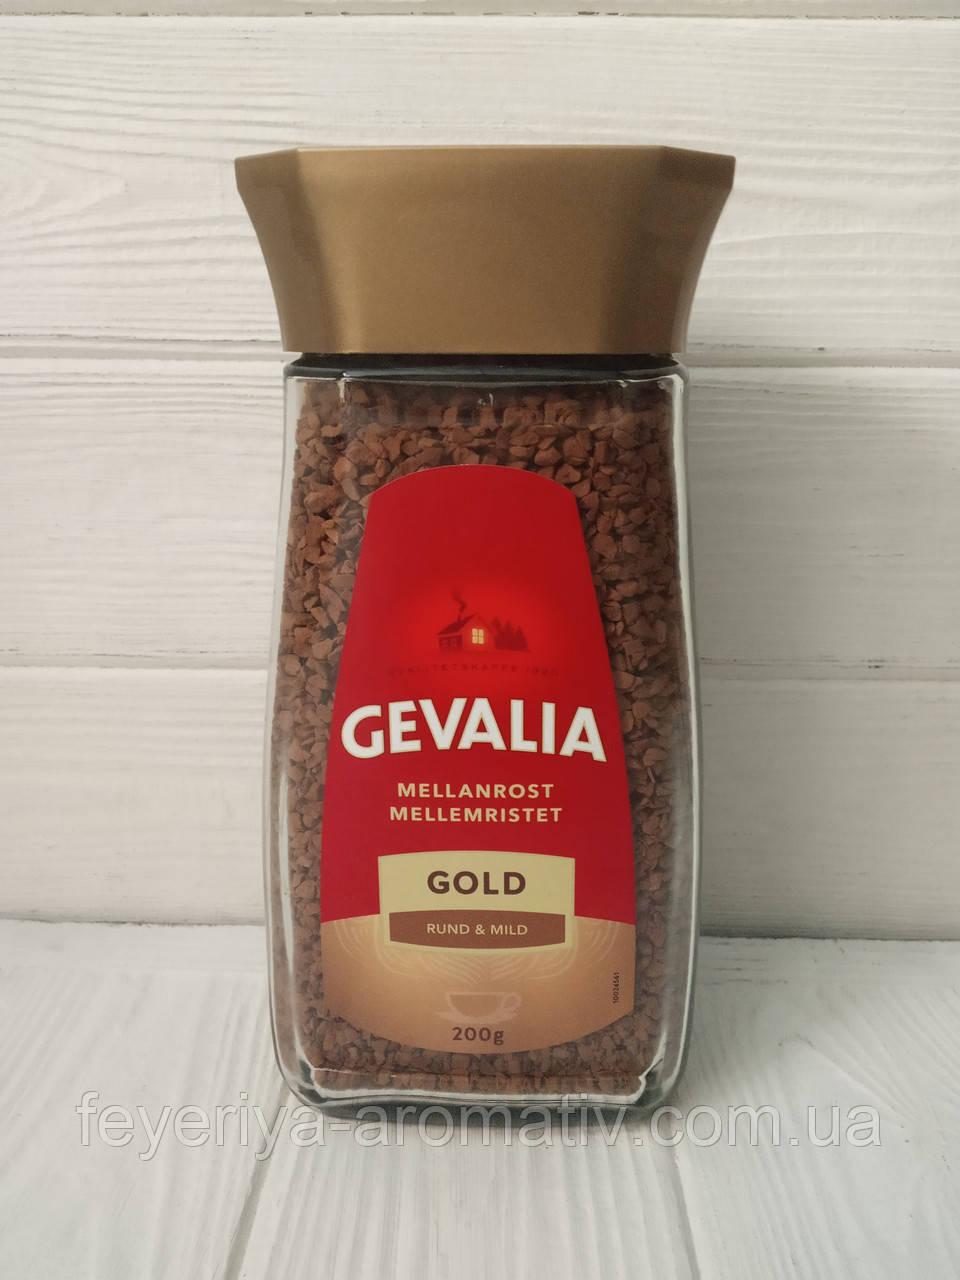 Кофе растворимый Gevalia Mellanrost Gold 200гр (Нидерланды)